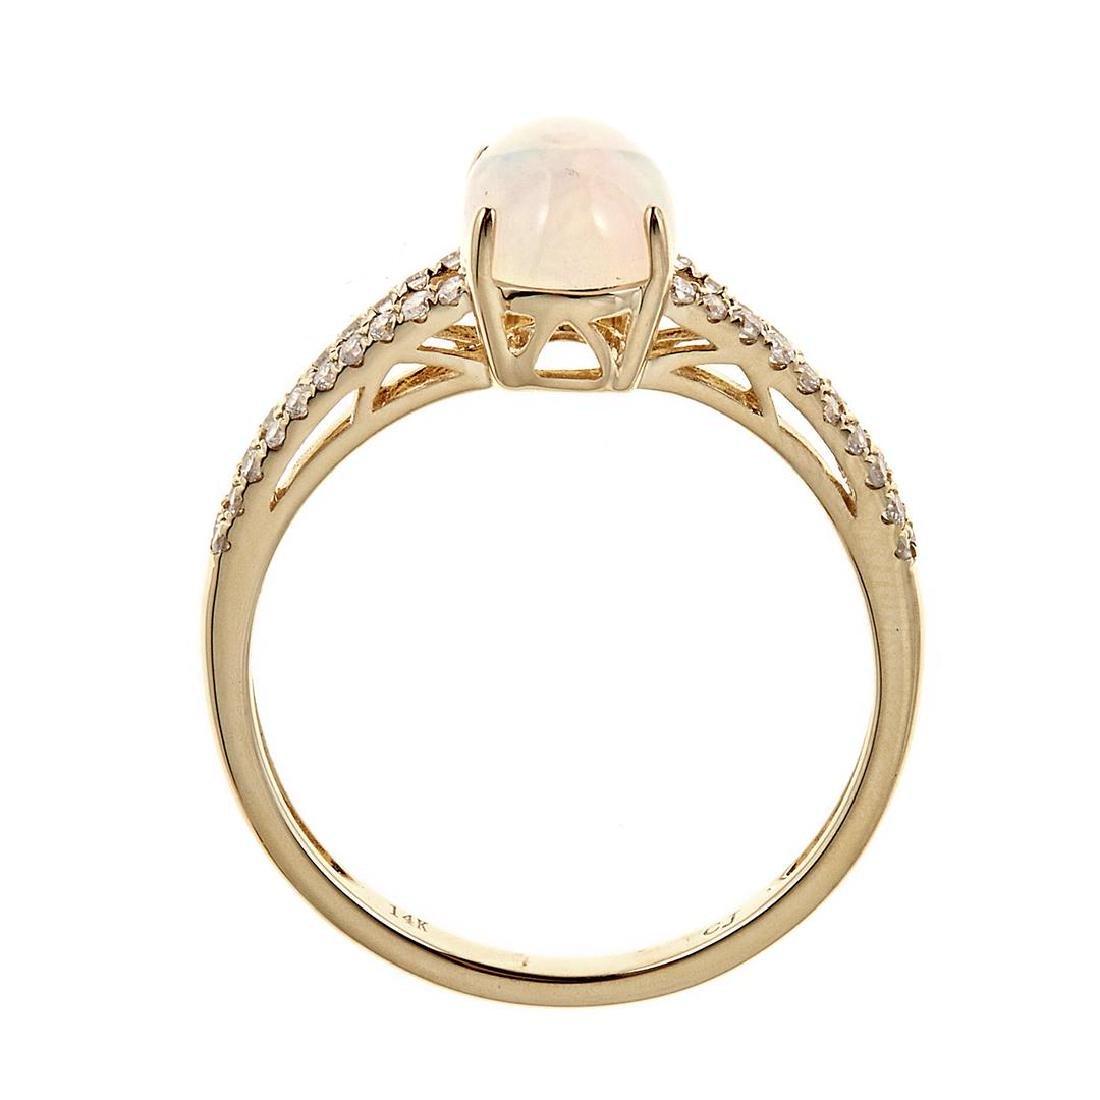 0.9 ctw Ethiopian Opal and Diamond Ring - 14KT Yellow - 2